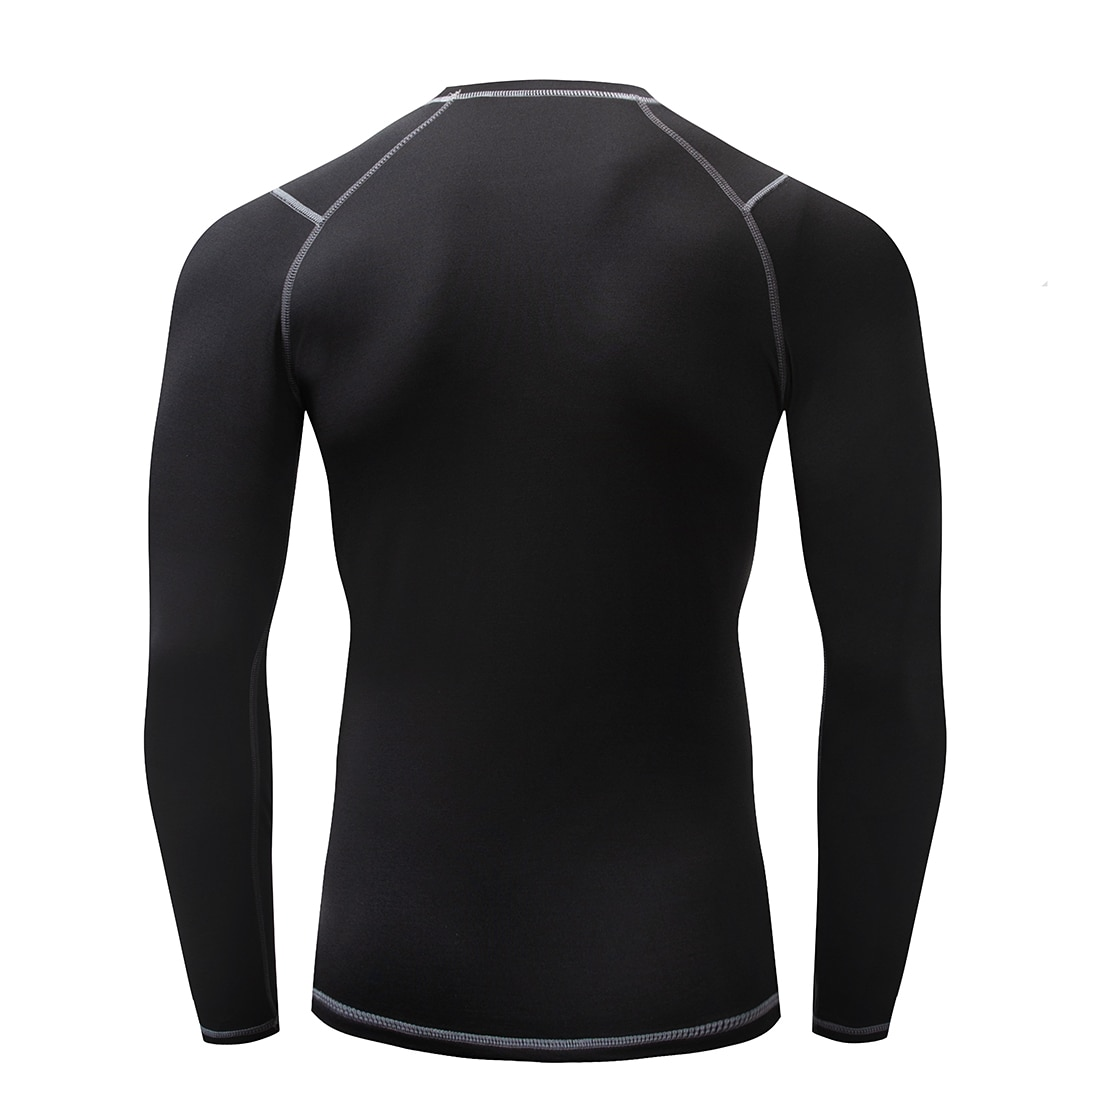 WOSAWE Motorcycle Thermal Underwear Set Men's Motorcycle Skiing Winter Warm Base Layers Tight Long Johns Tops & Pants Set enlarge